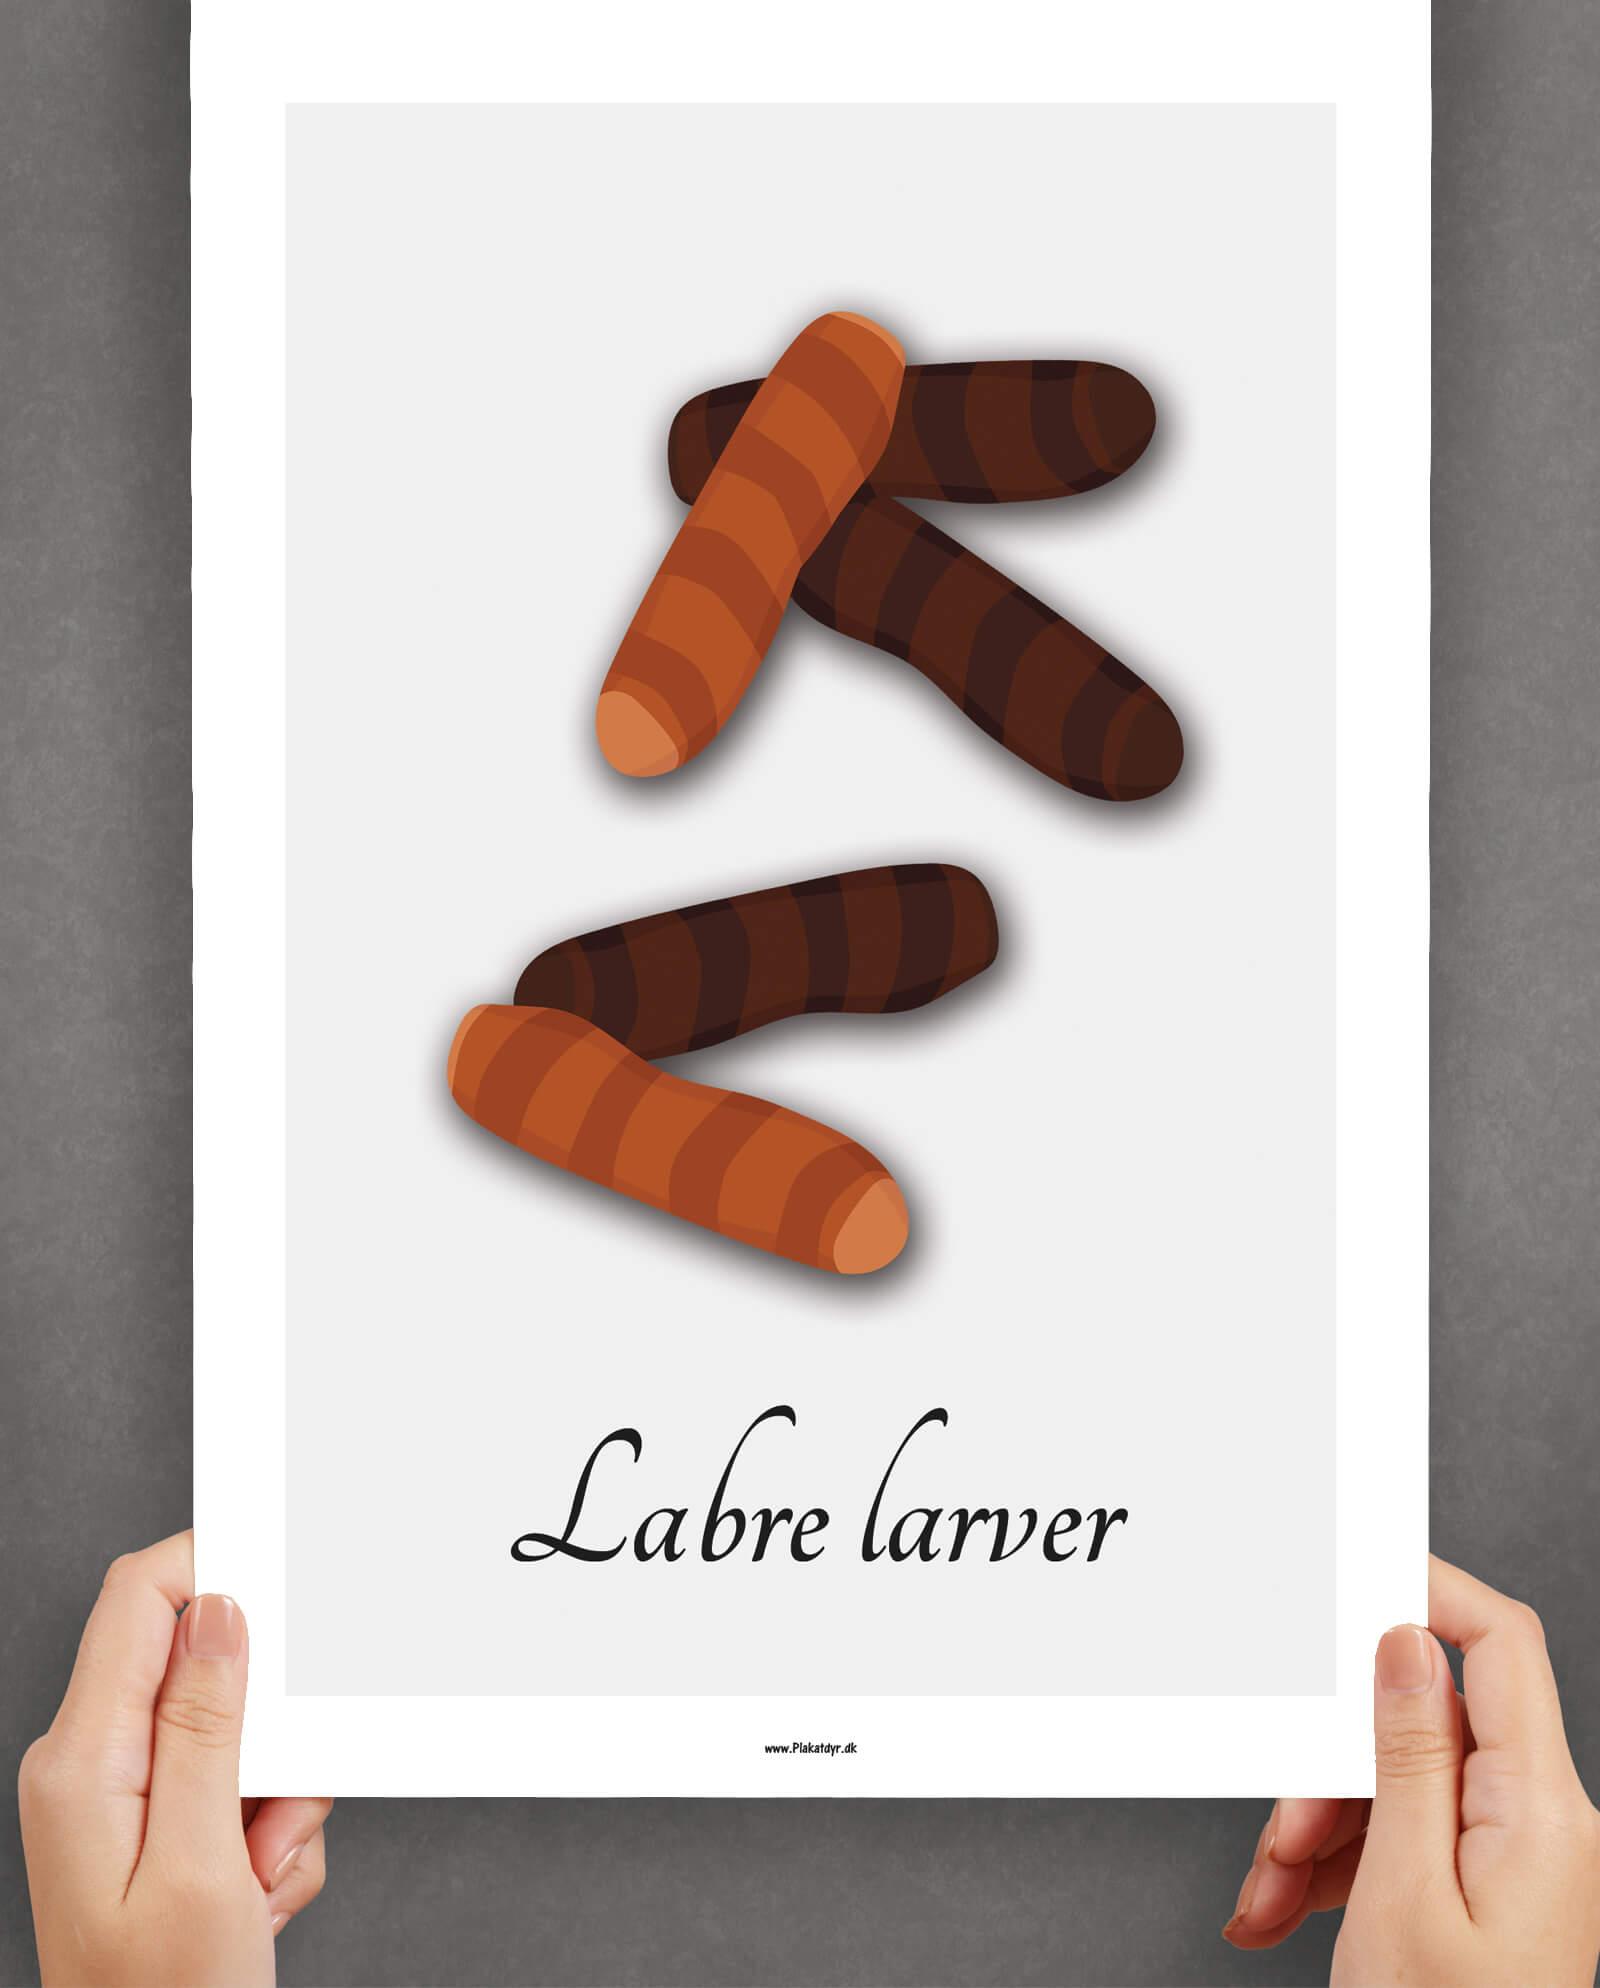 labre-larver-graa-2